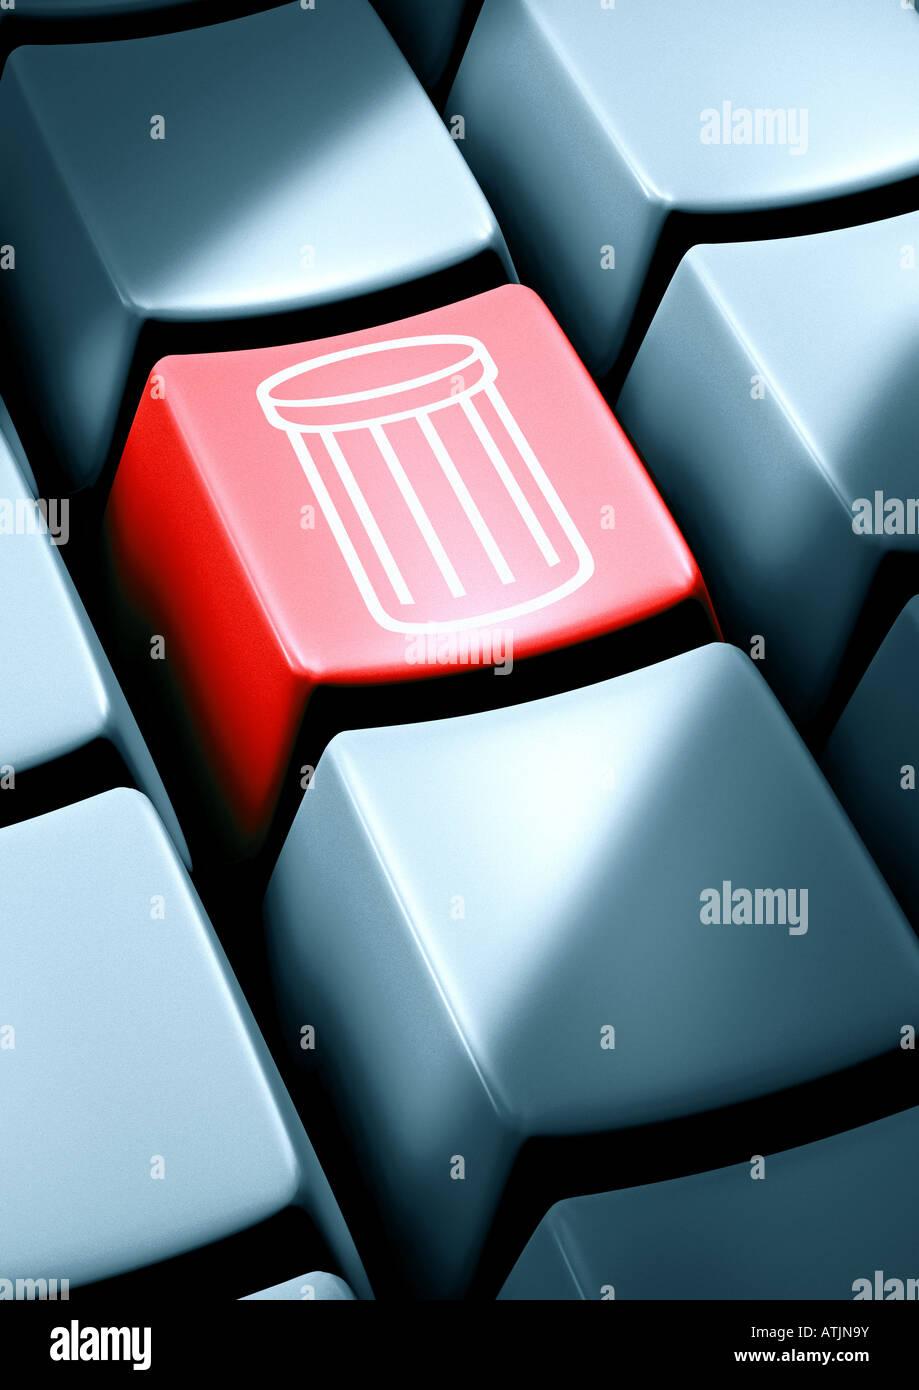 recycle bin on a key Papierkorb auf einer Taste - Stock Image